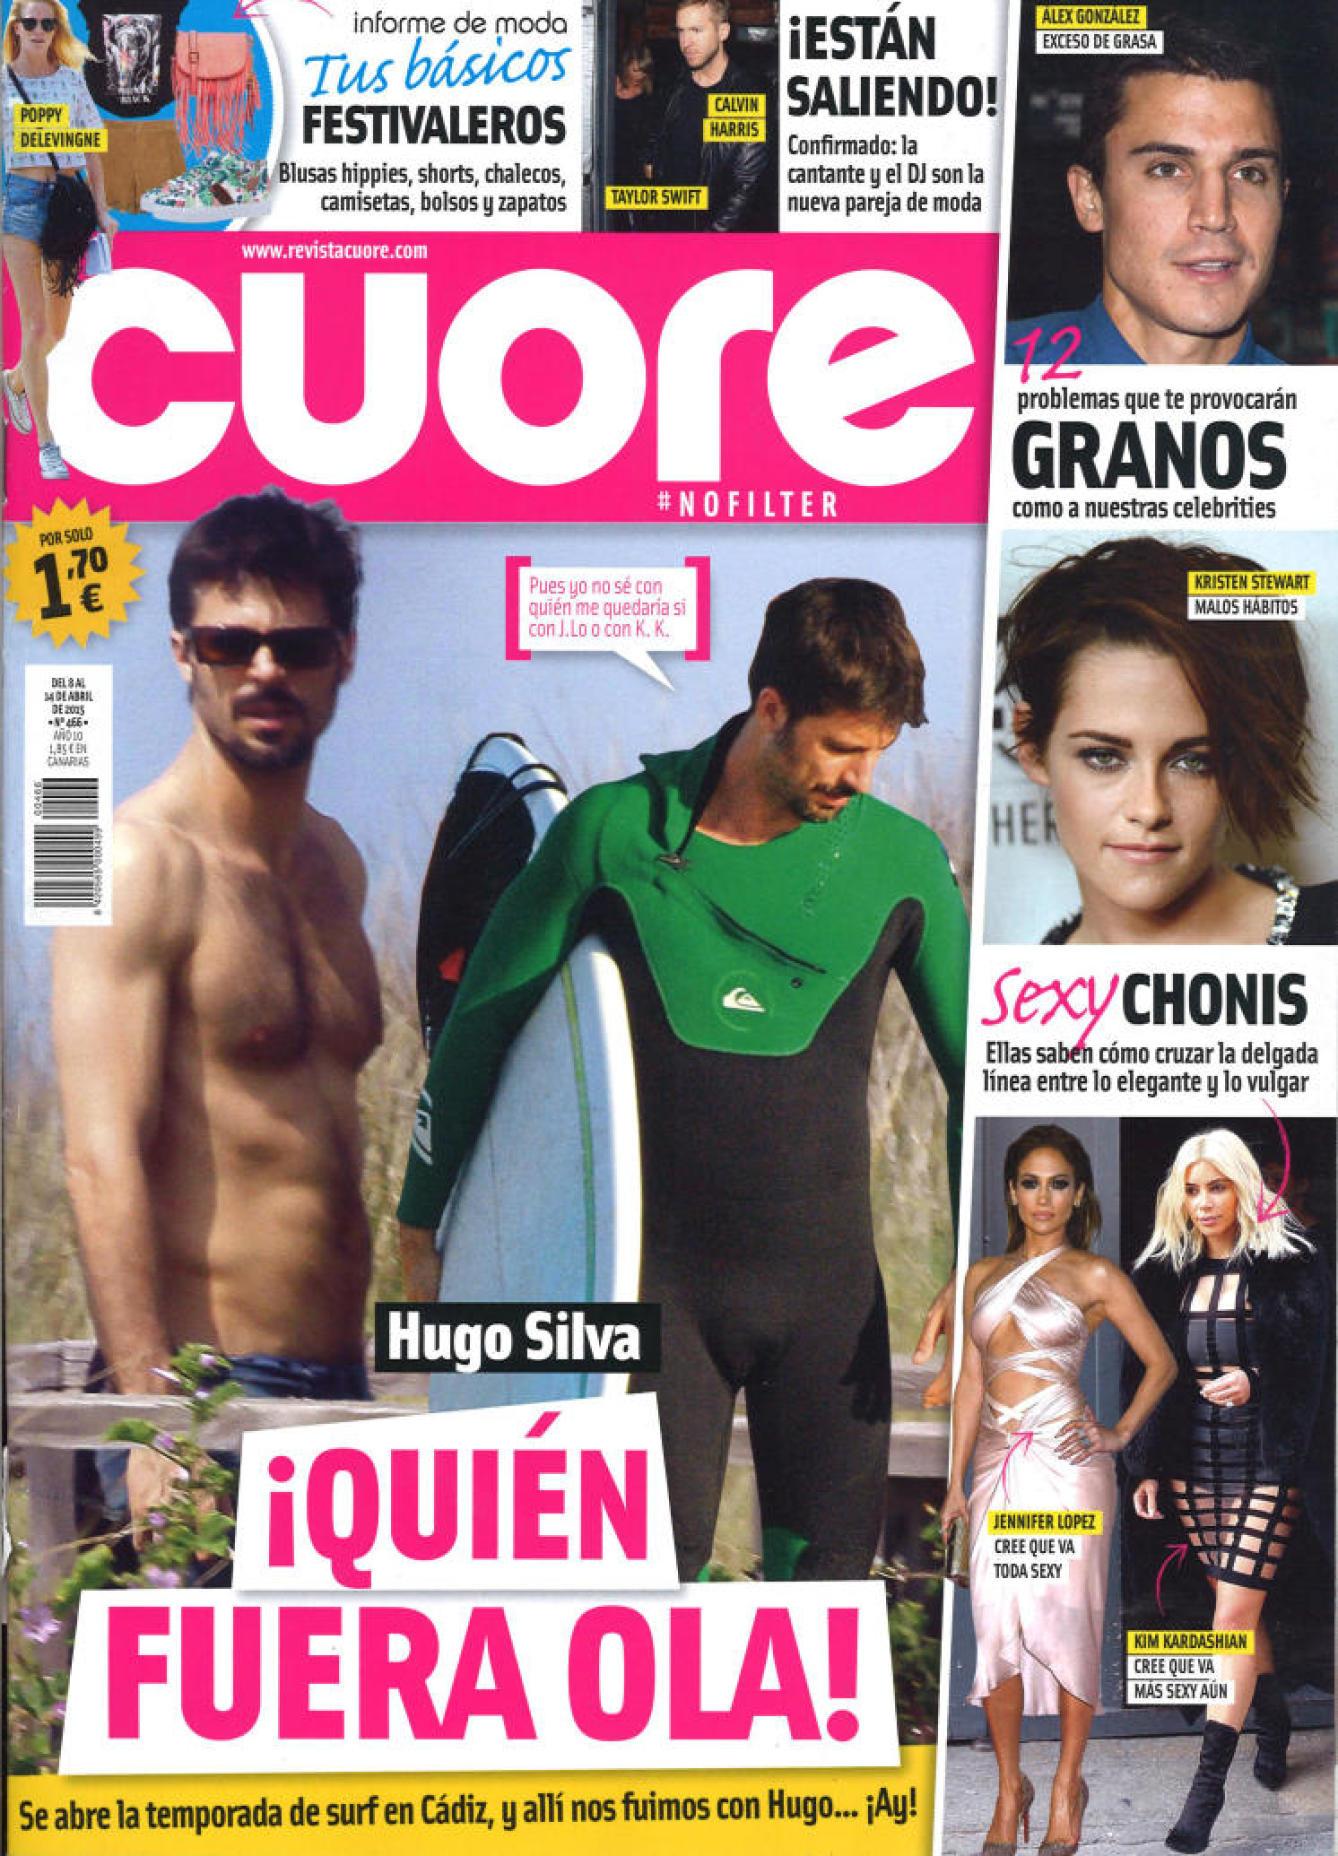 CUORE portada 8 de Abril 2015